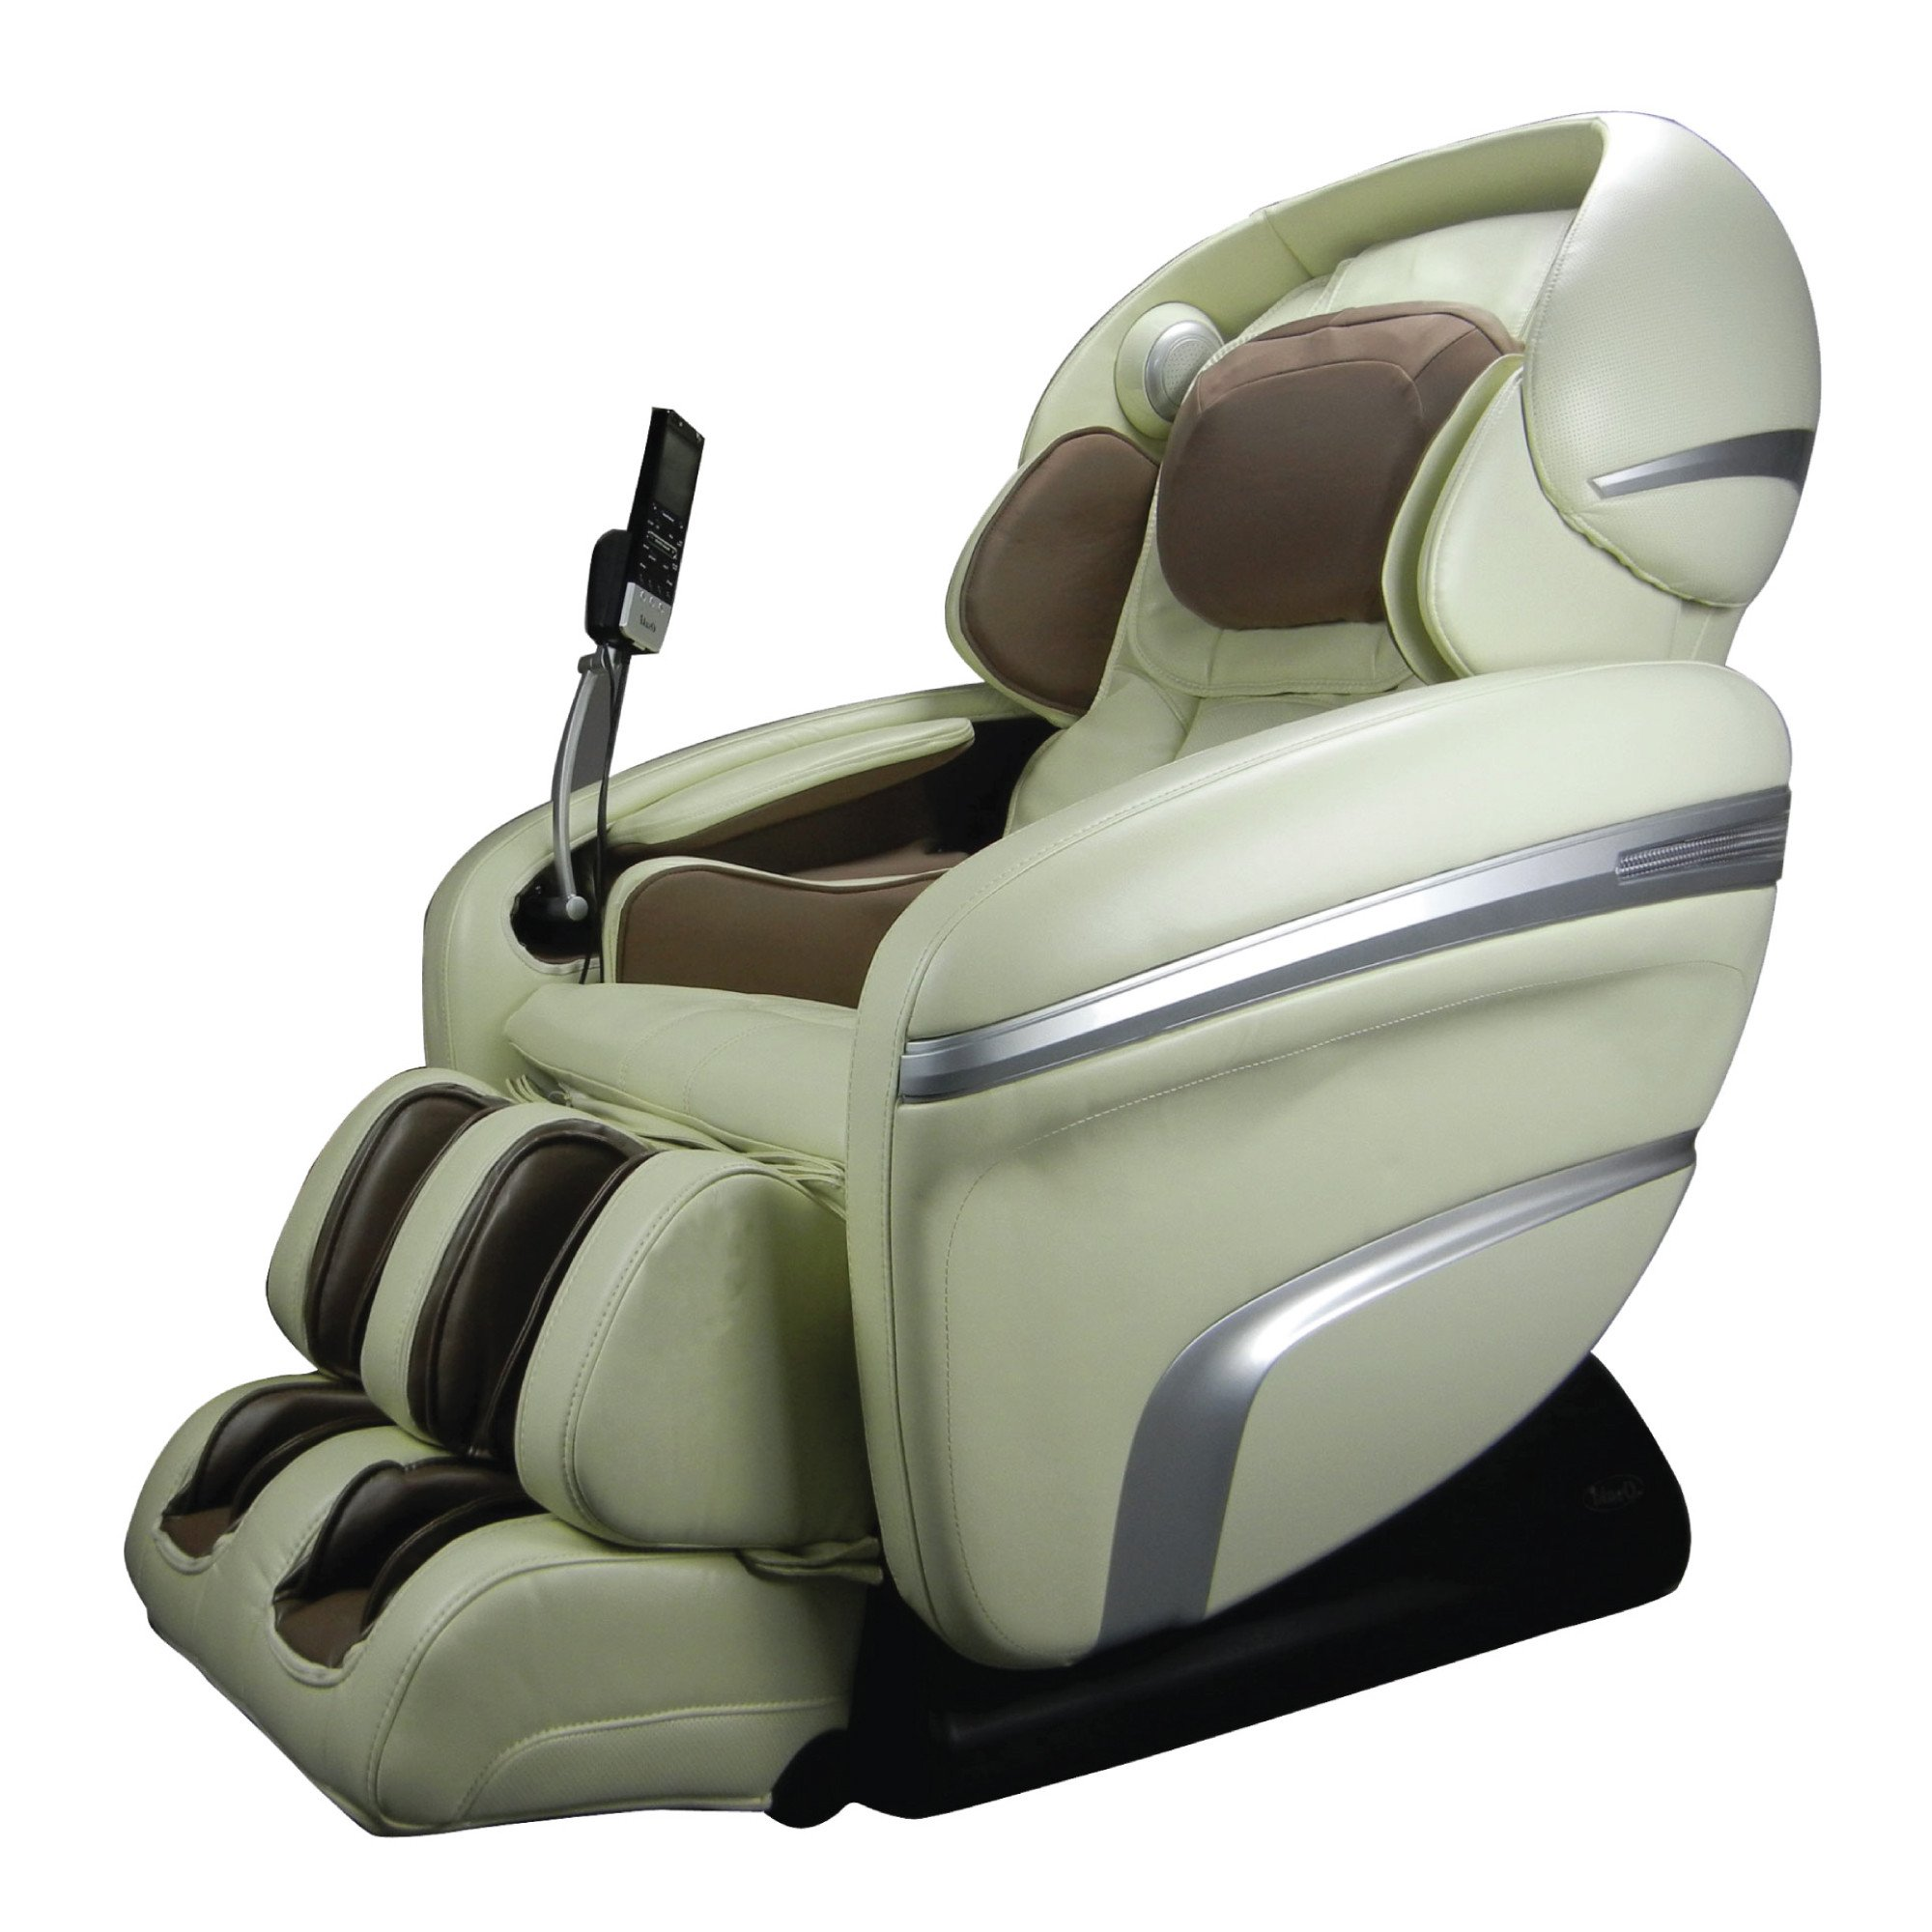 Osaki 7200CR Massage Chair - Cream - Front Angle View